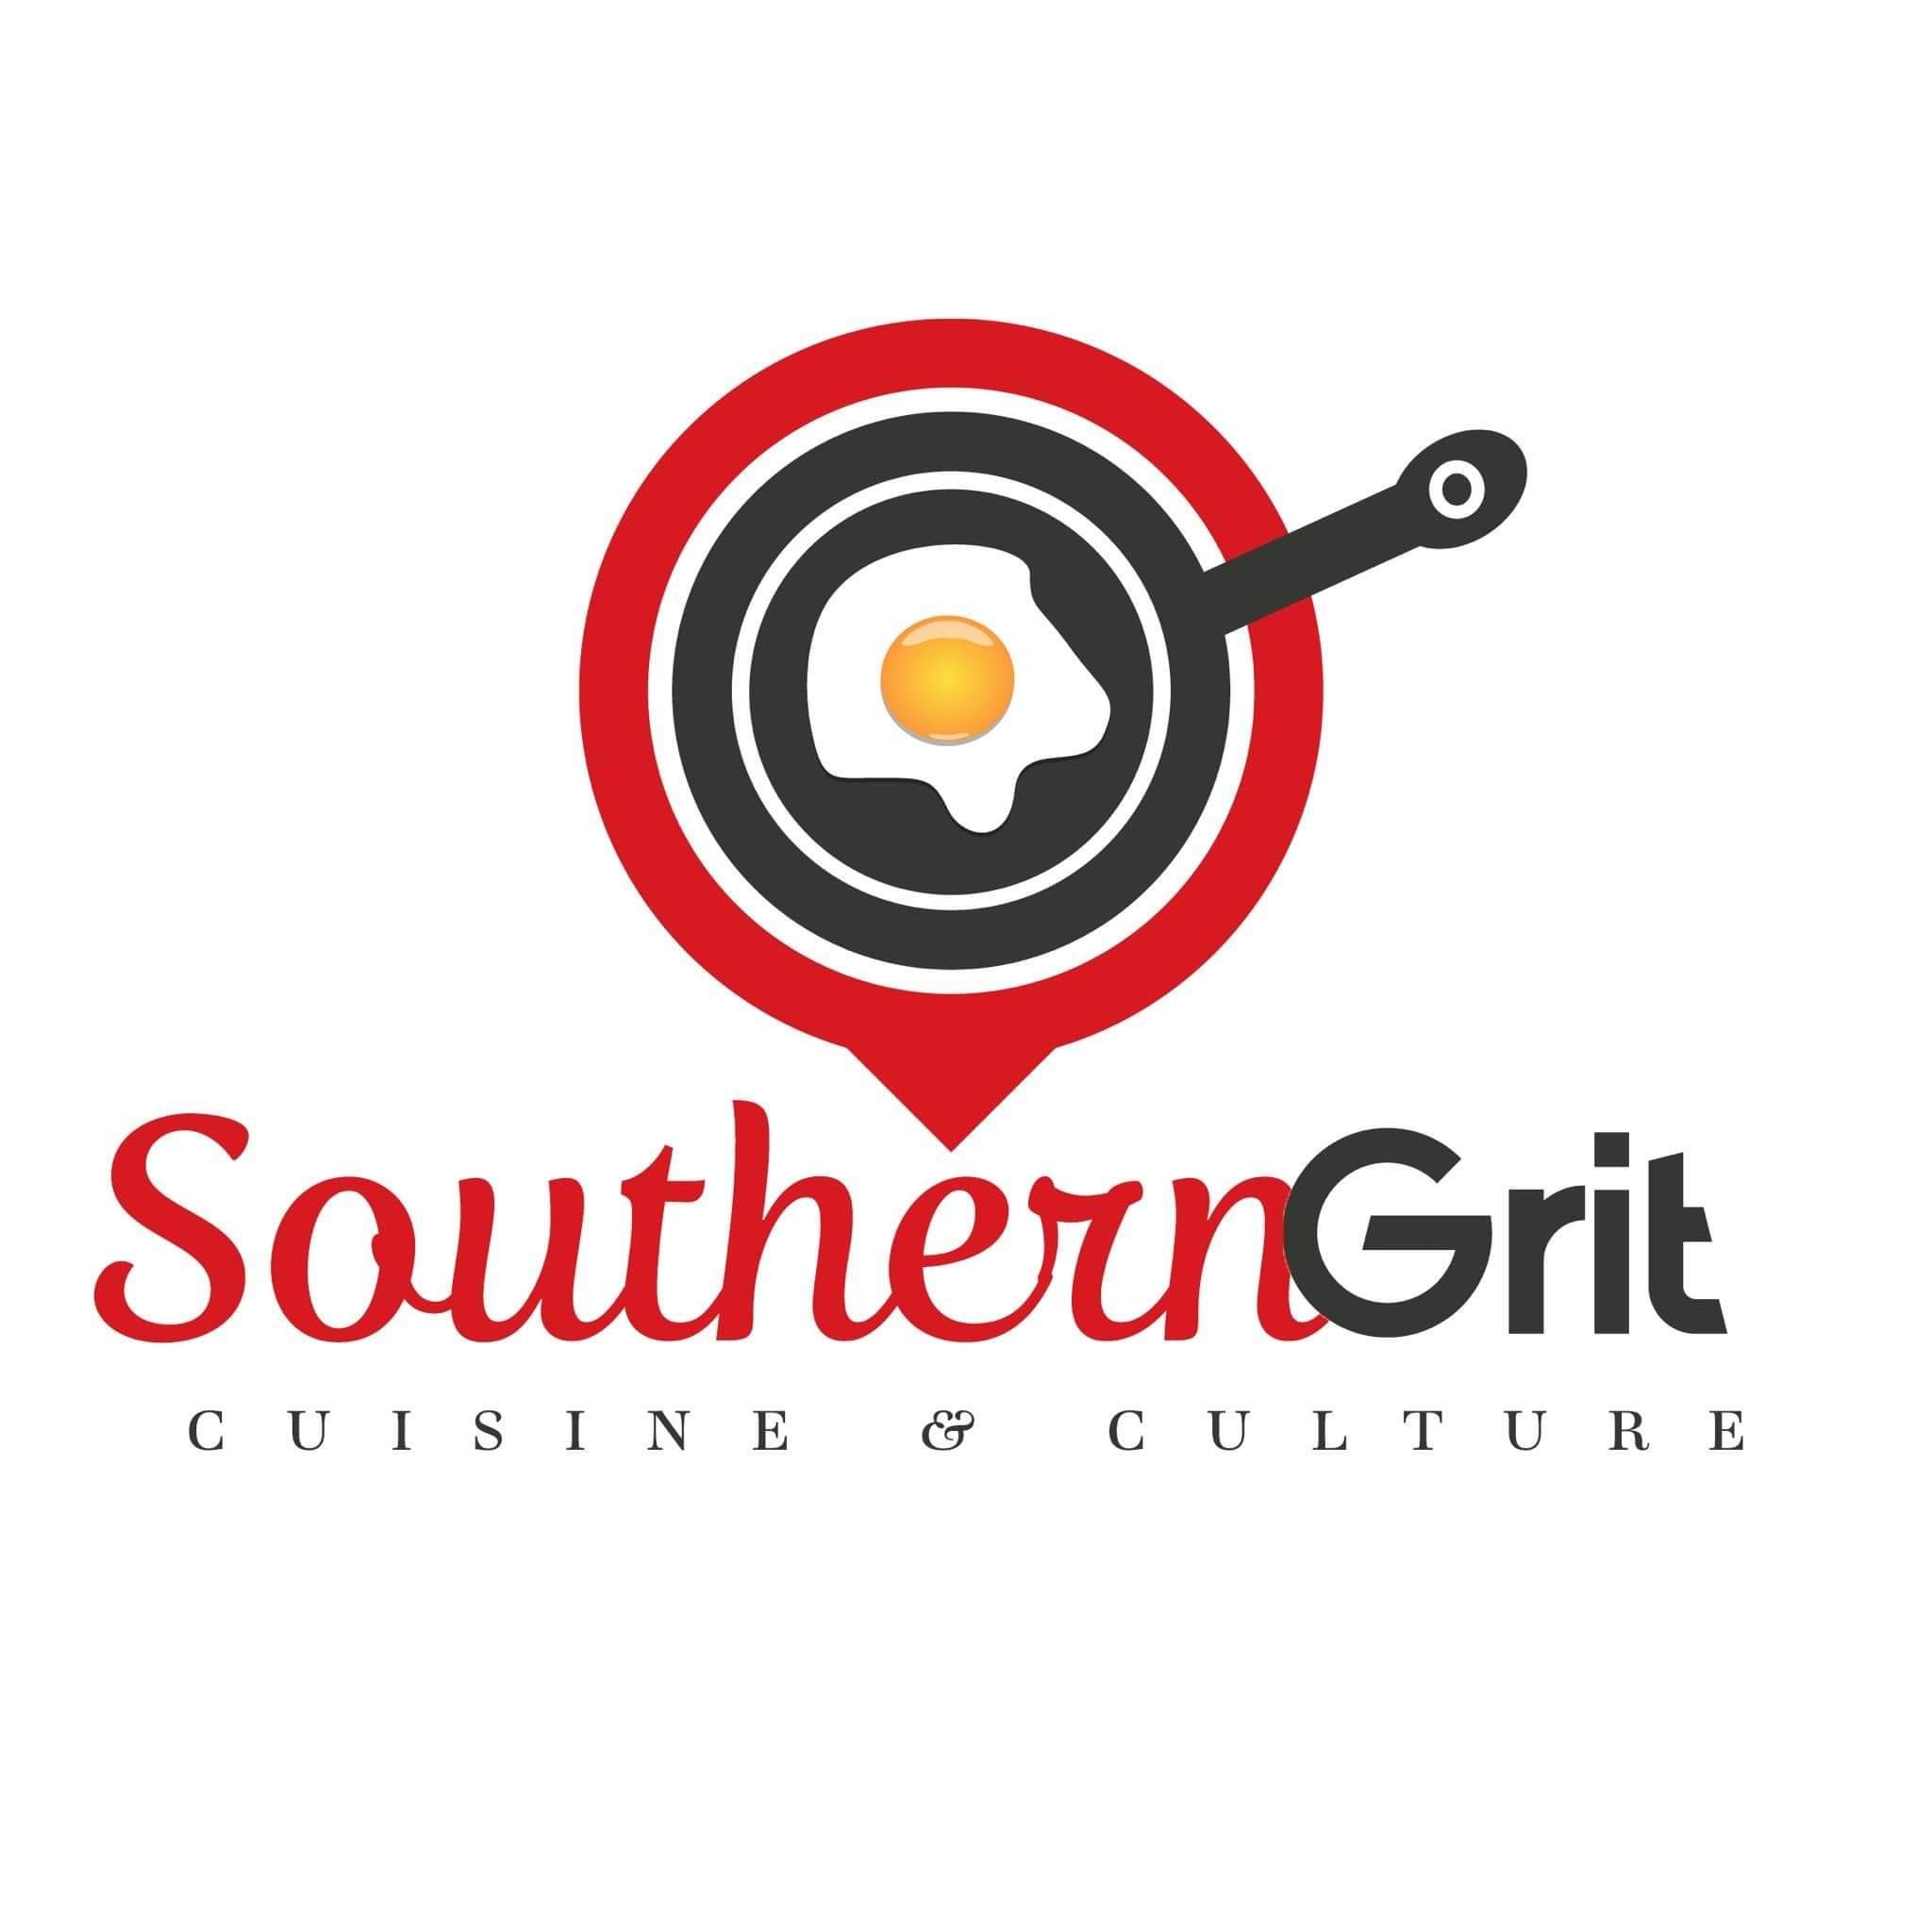 Southern Grit